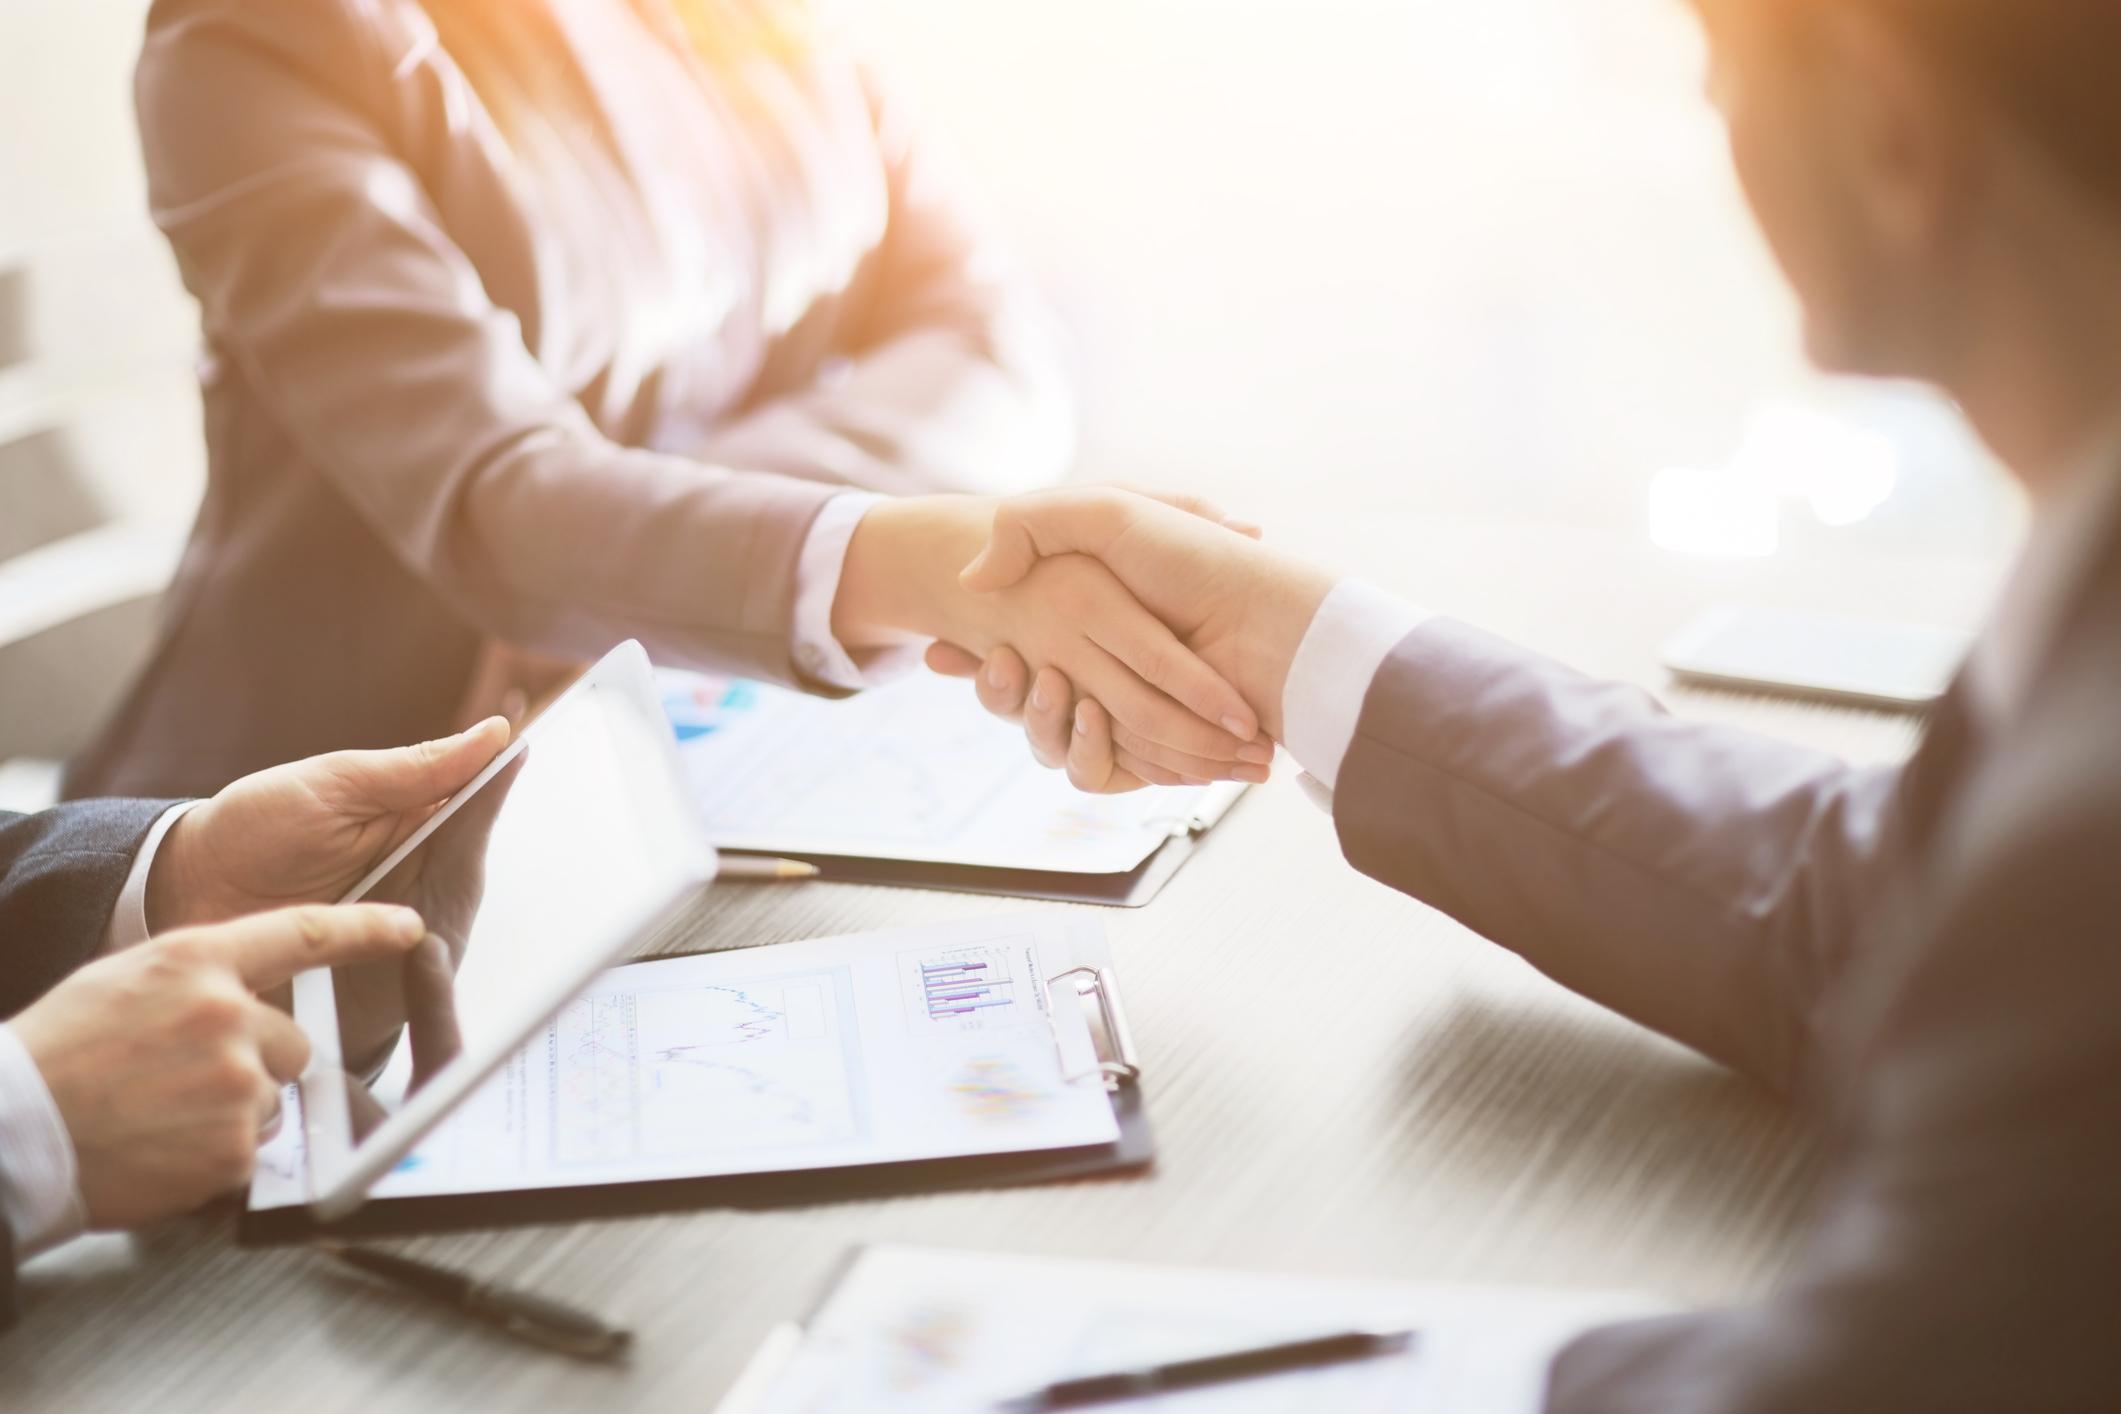 Novato Group Business Services